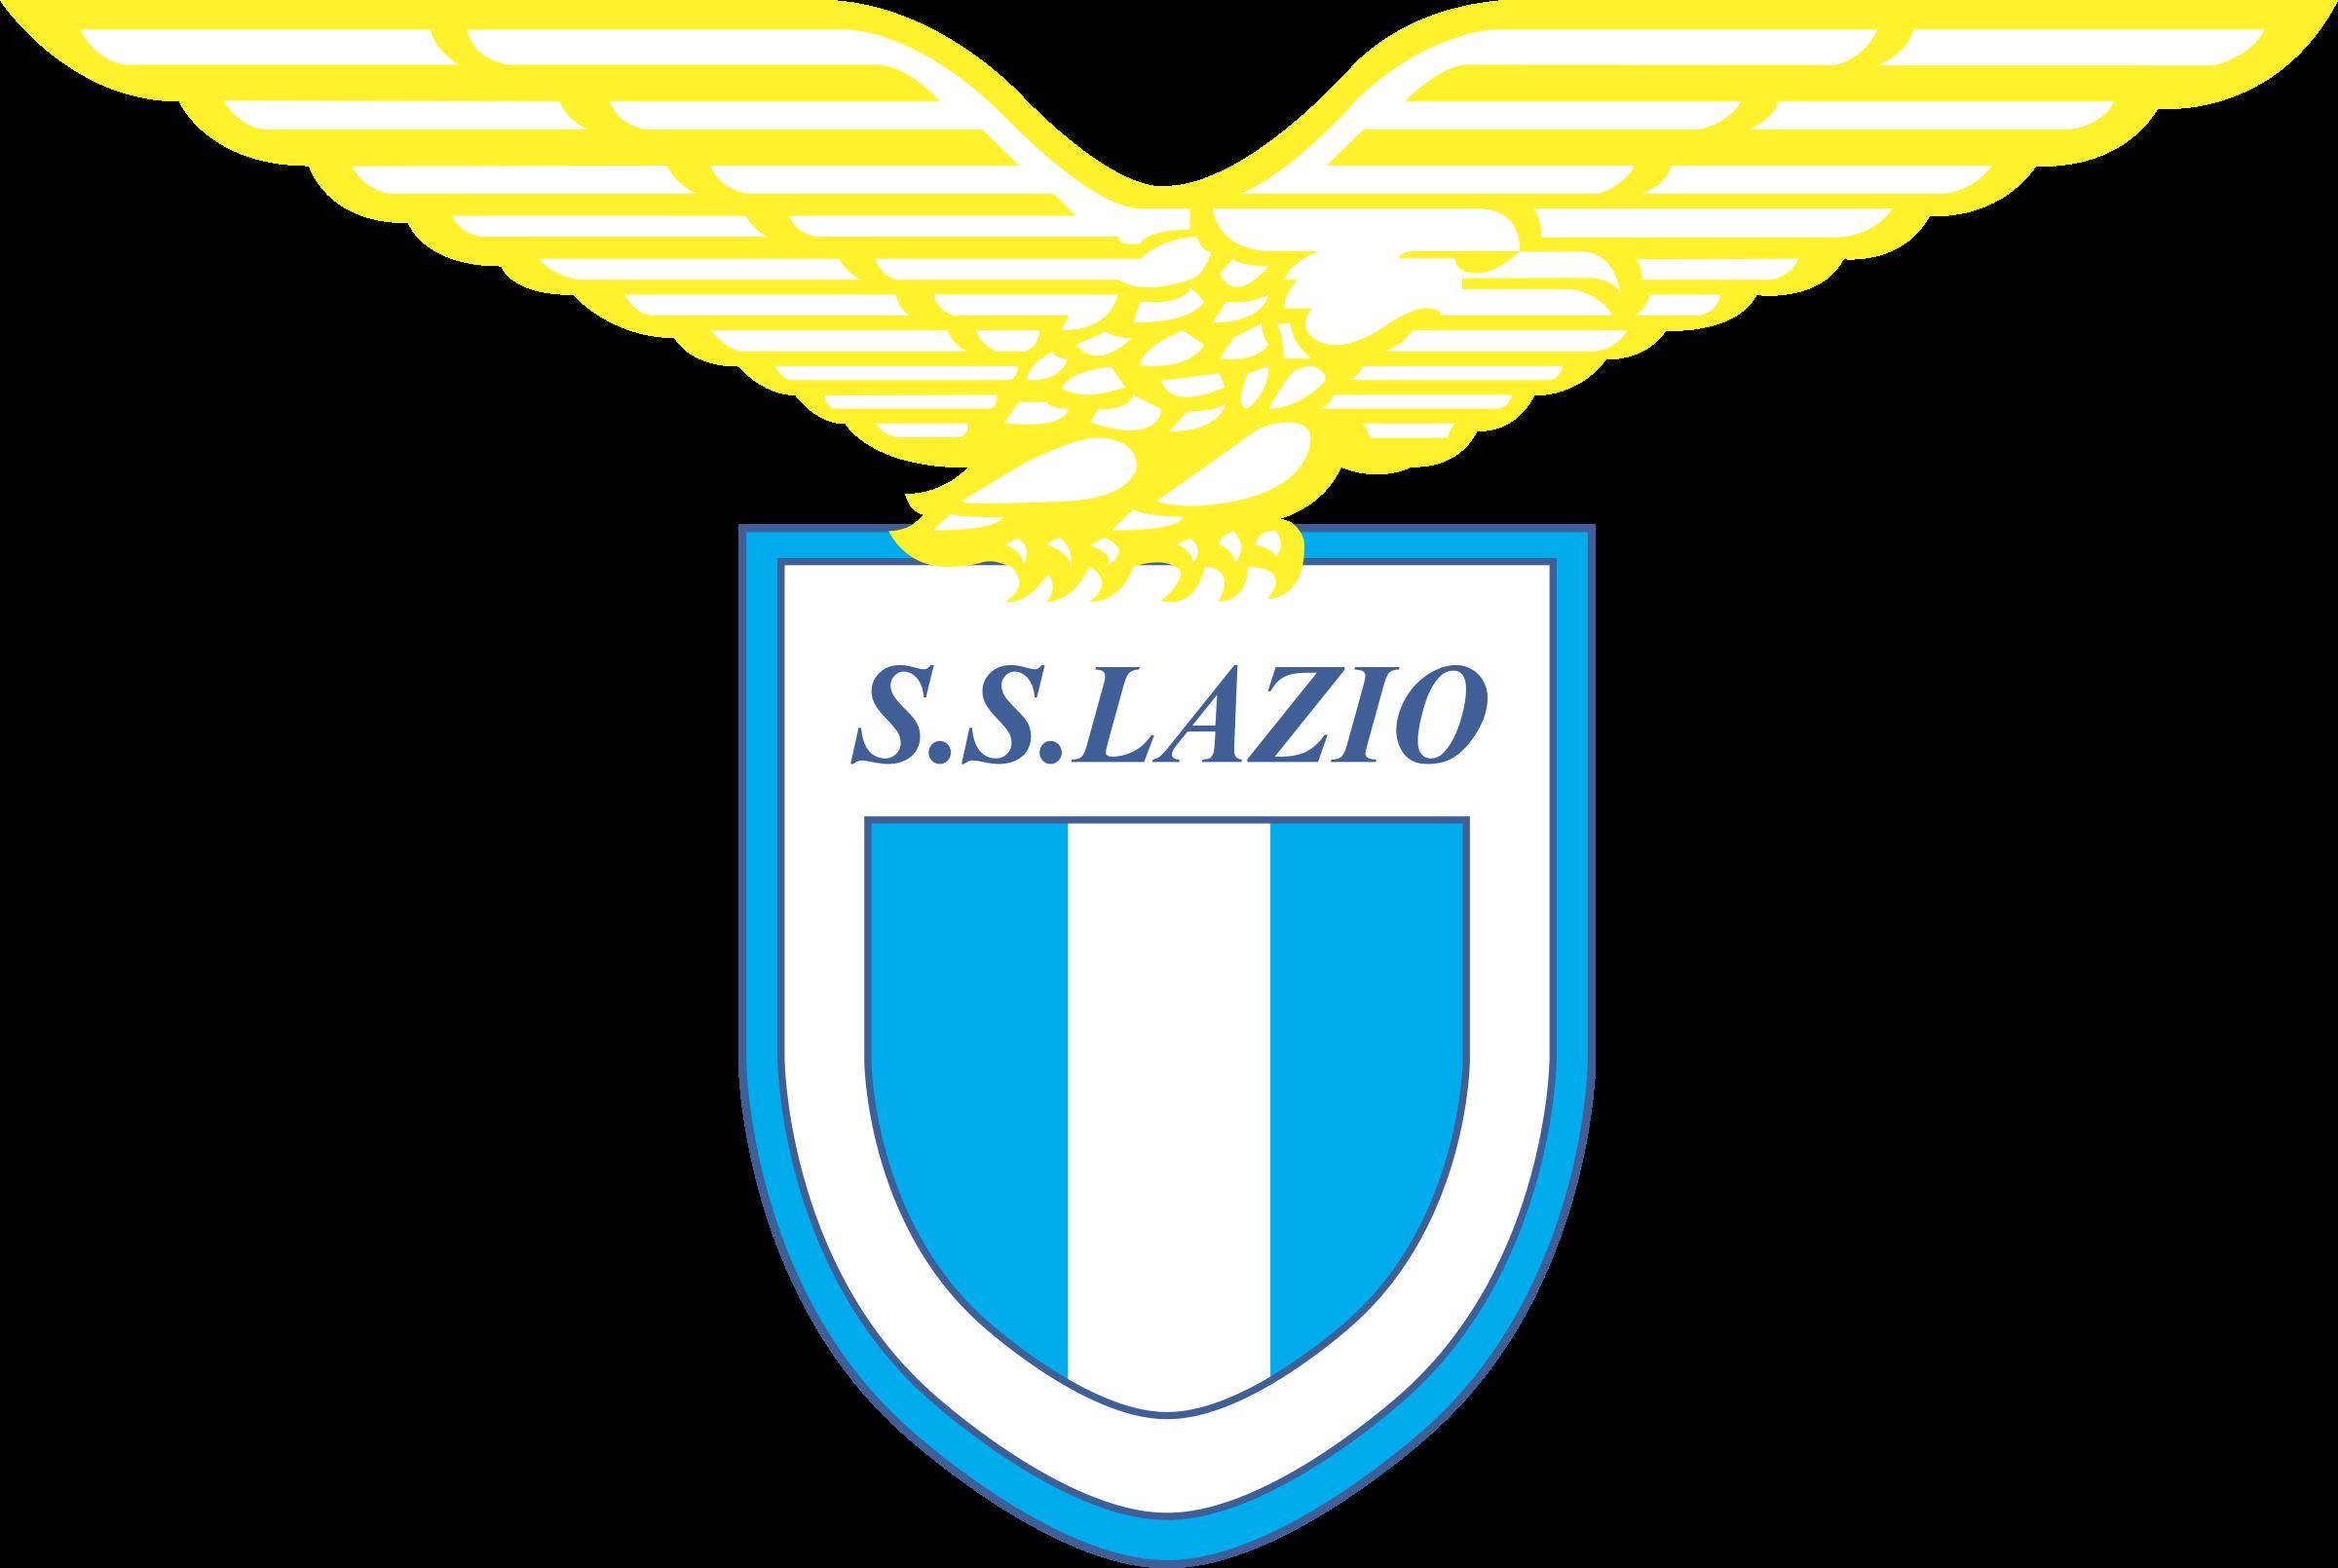 LAZIO Logo PNG Transparent & SVG Vector - Freebie Supply